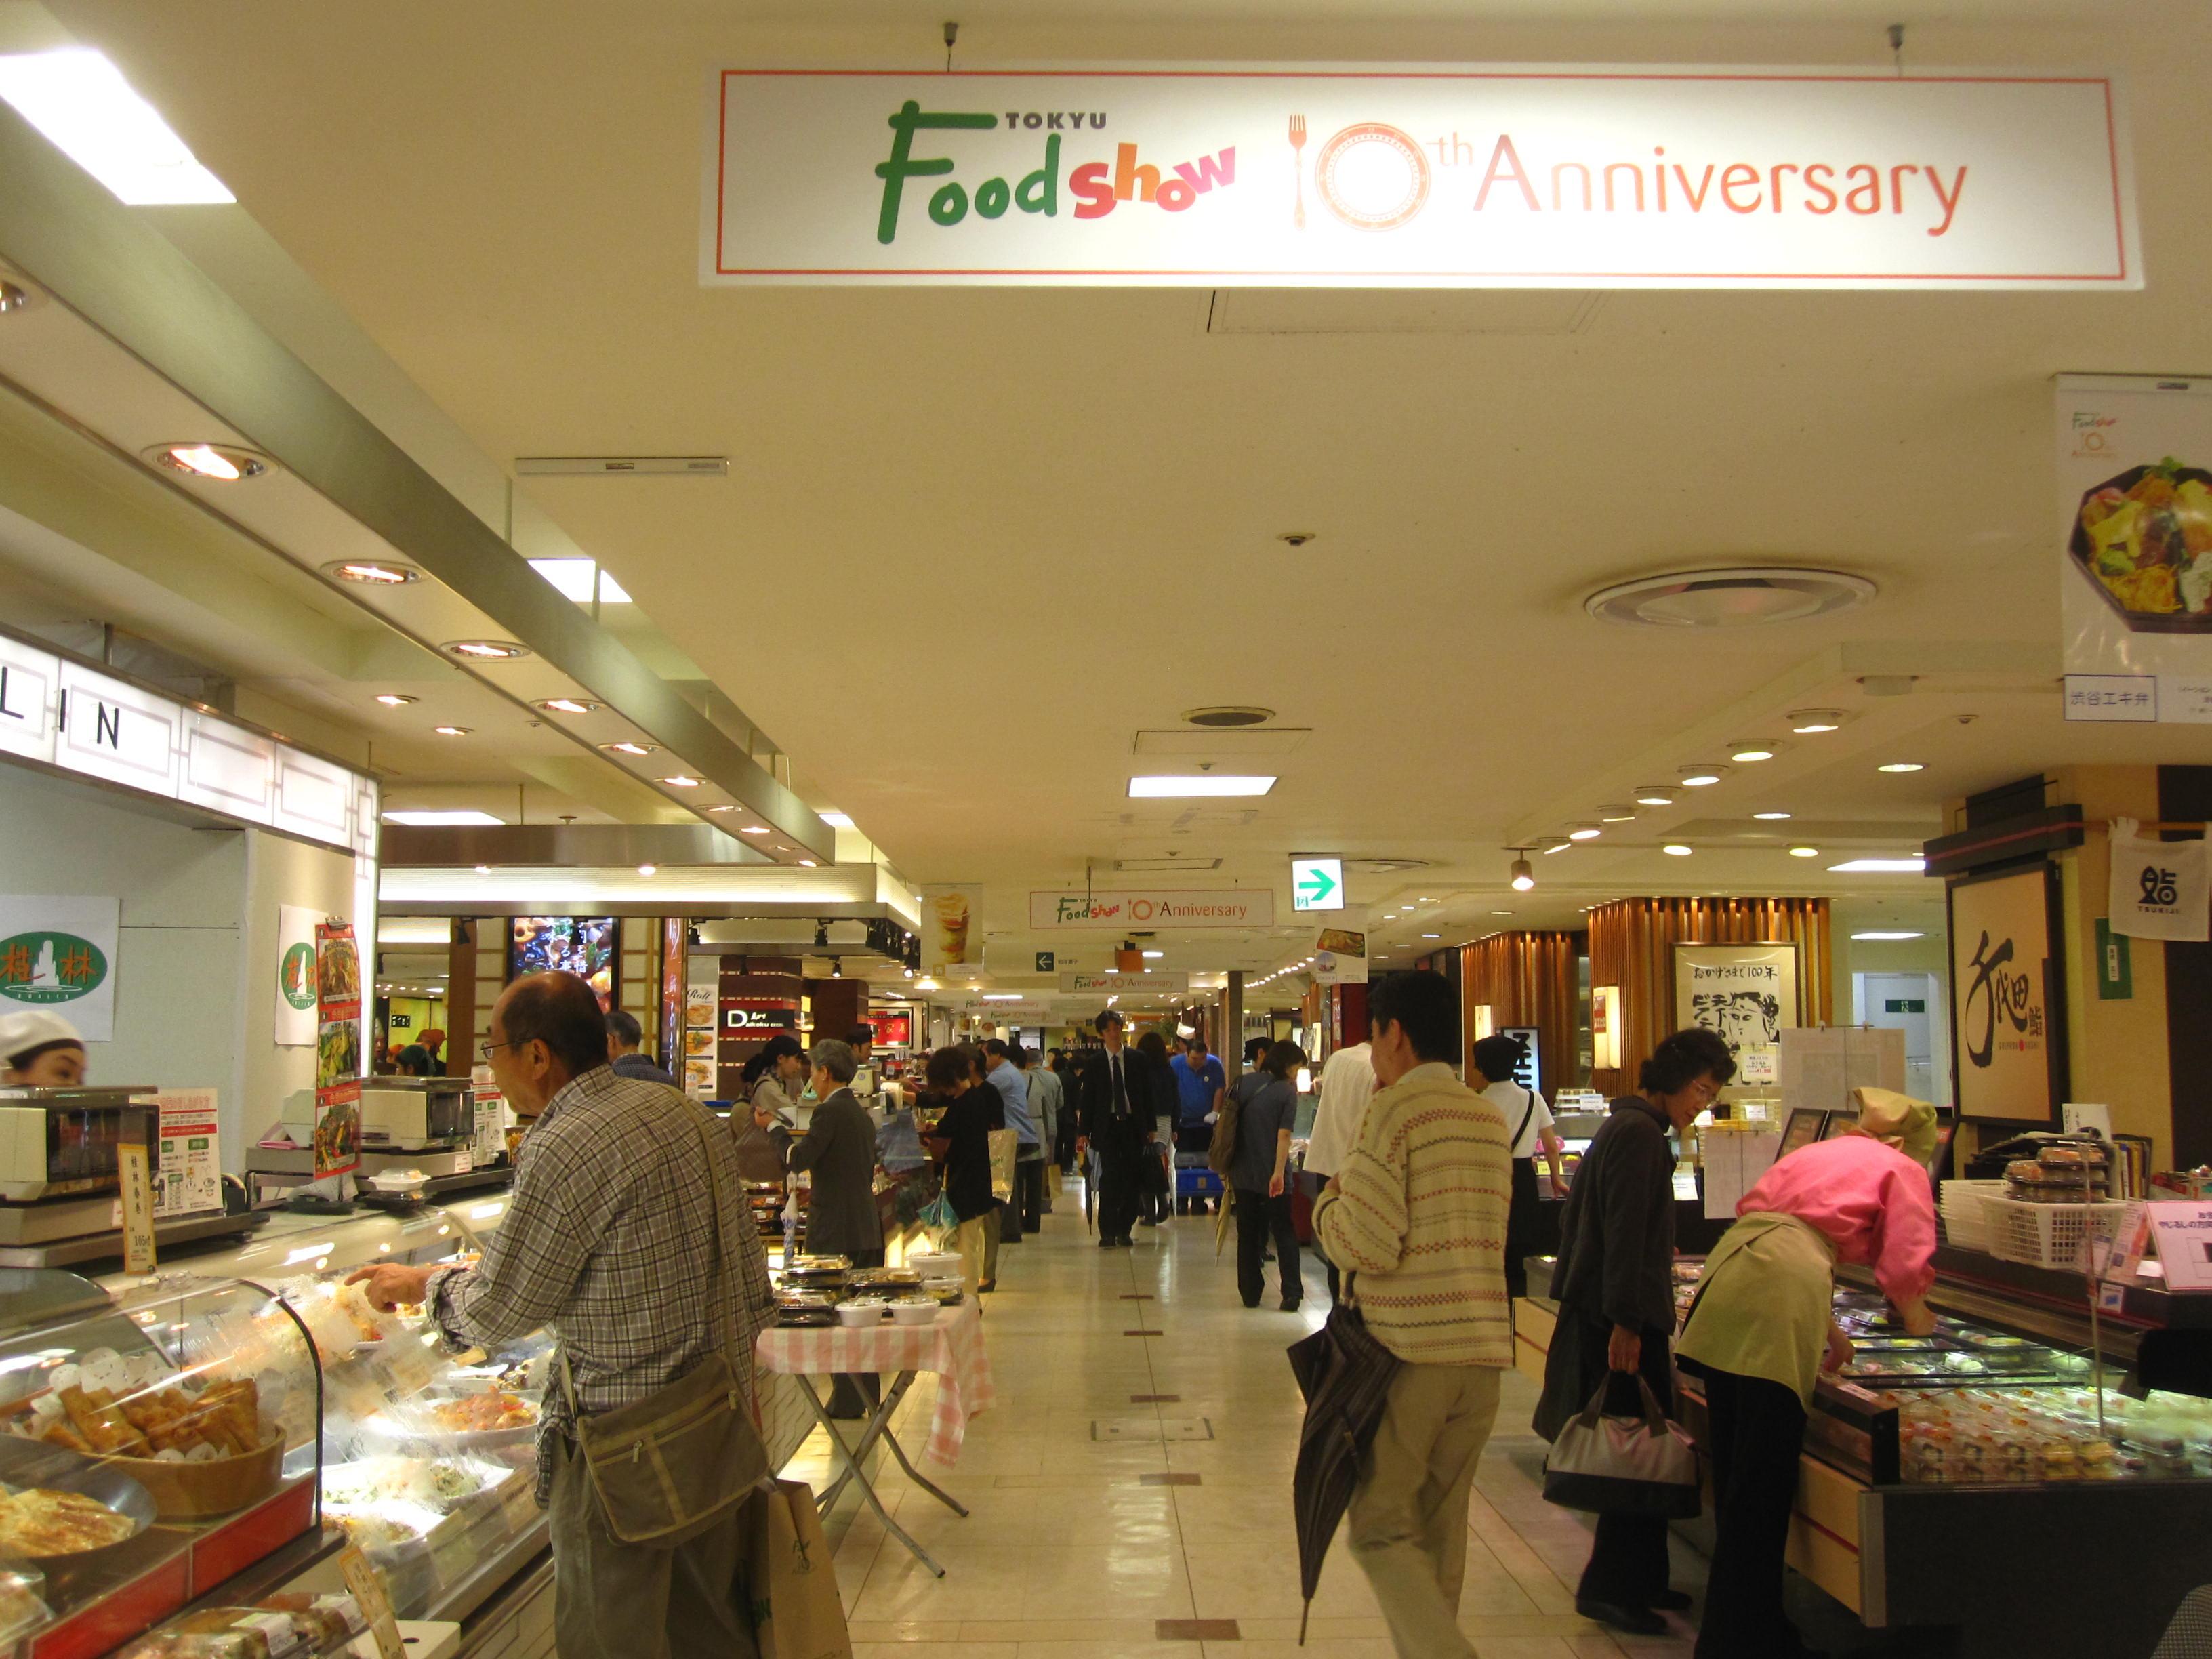 Tokyo food show